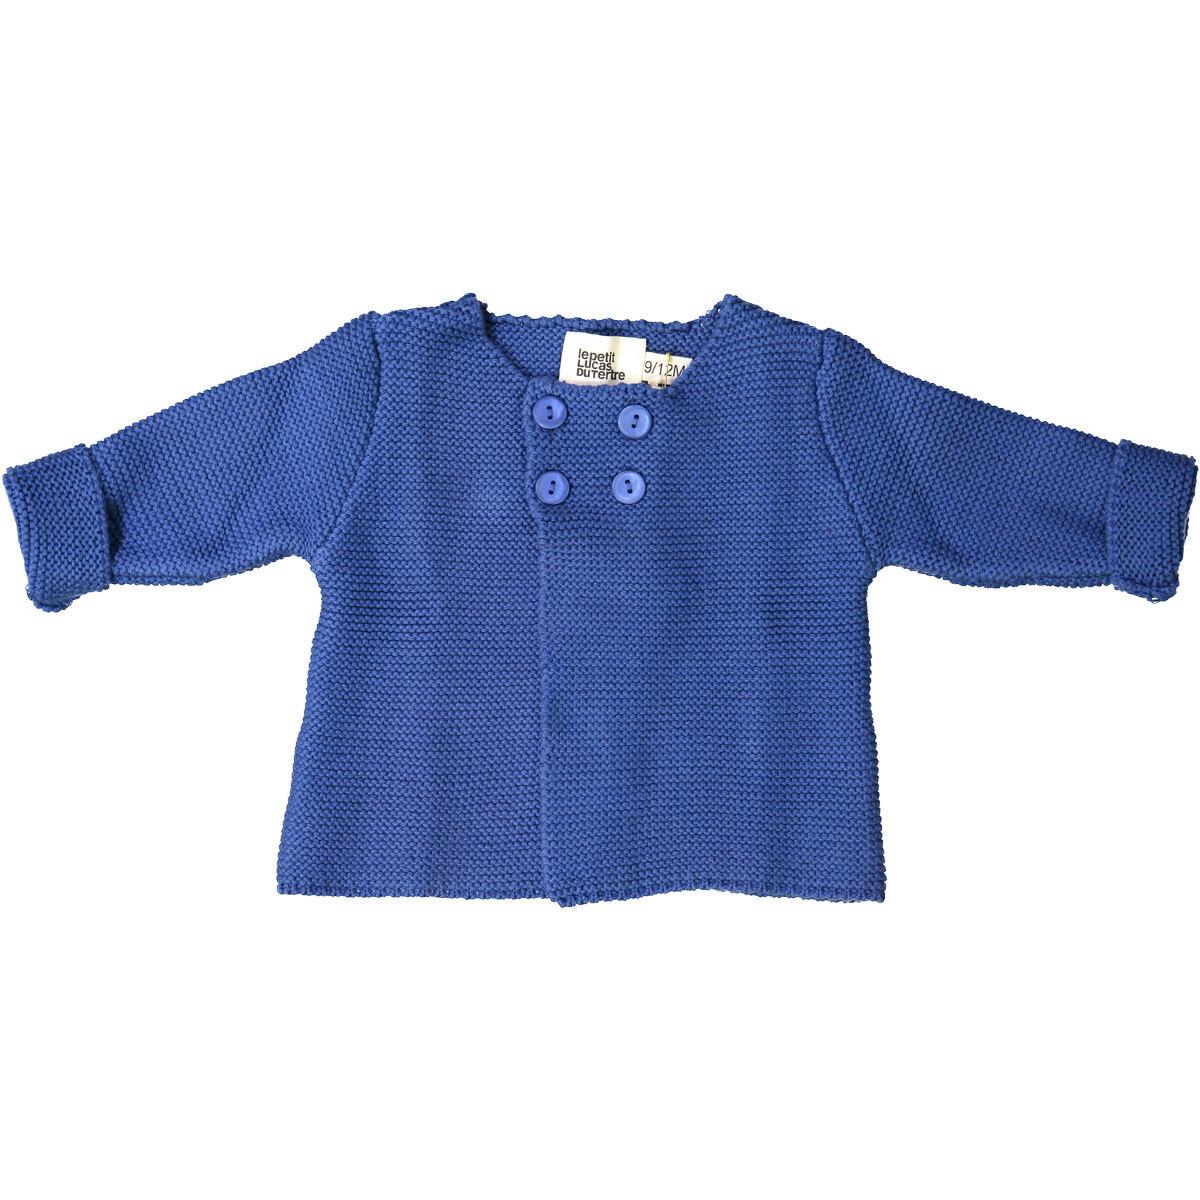 Hauts bébé Cardigan Julia - Blue - 6/9 Mois Cardigan Julia - Blue - 6/9 Mois